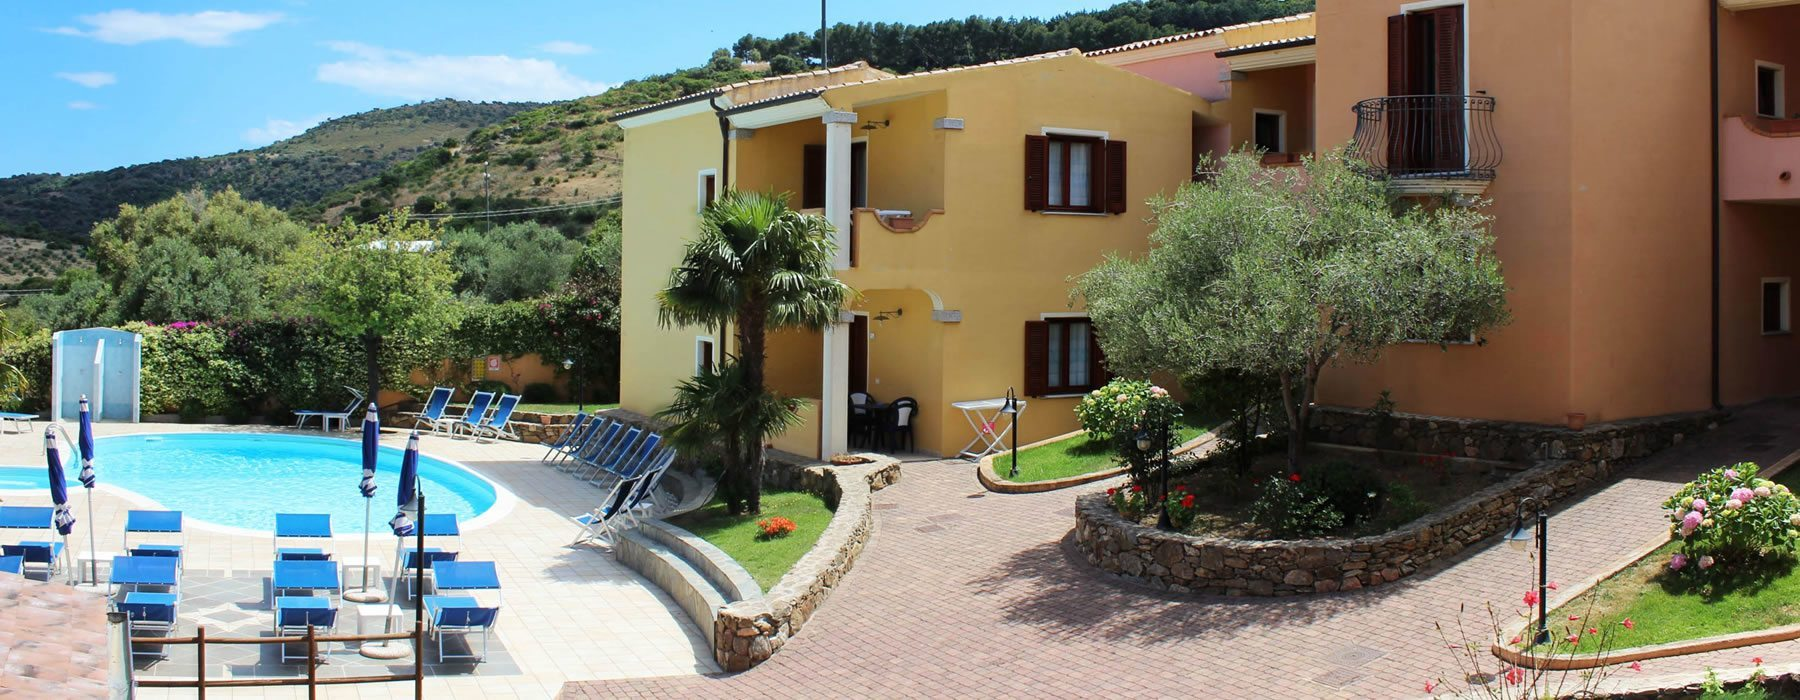 Residence budoni appartamenti sardegna residence corte for Residence budoni 2